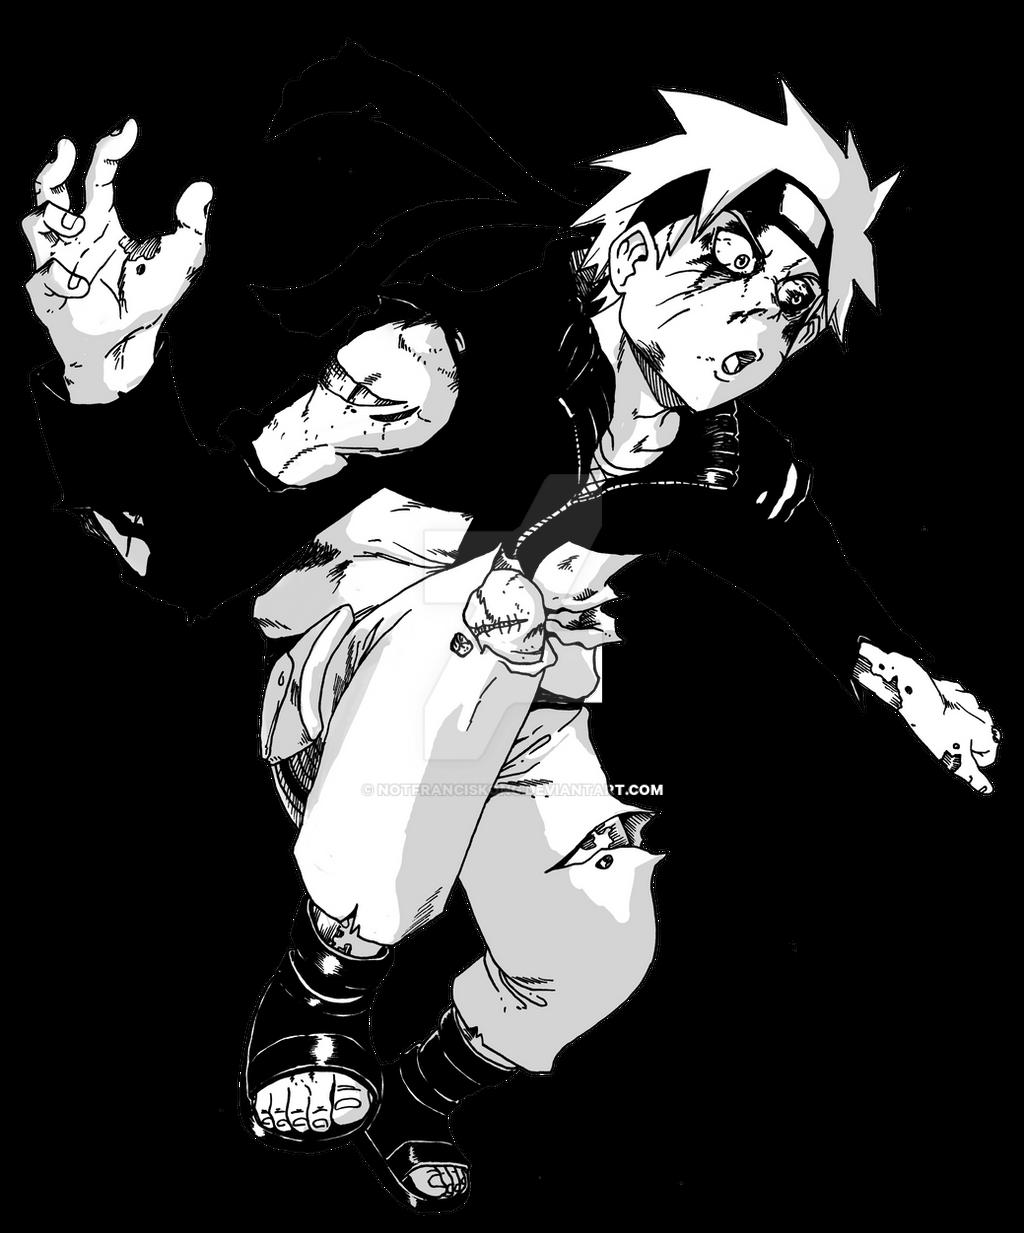 Naruto Zombie By Notfranciskong On DeviantArt